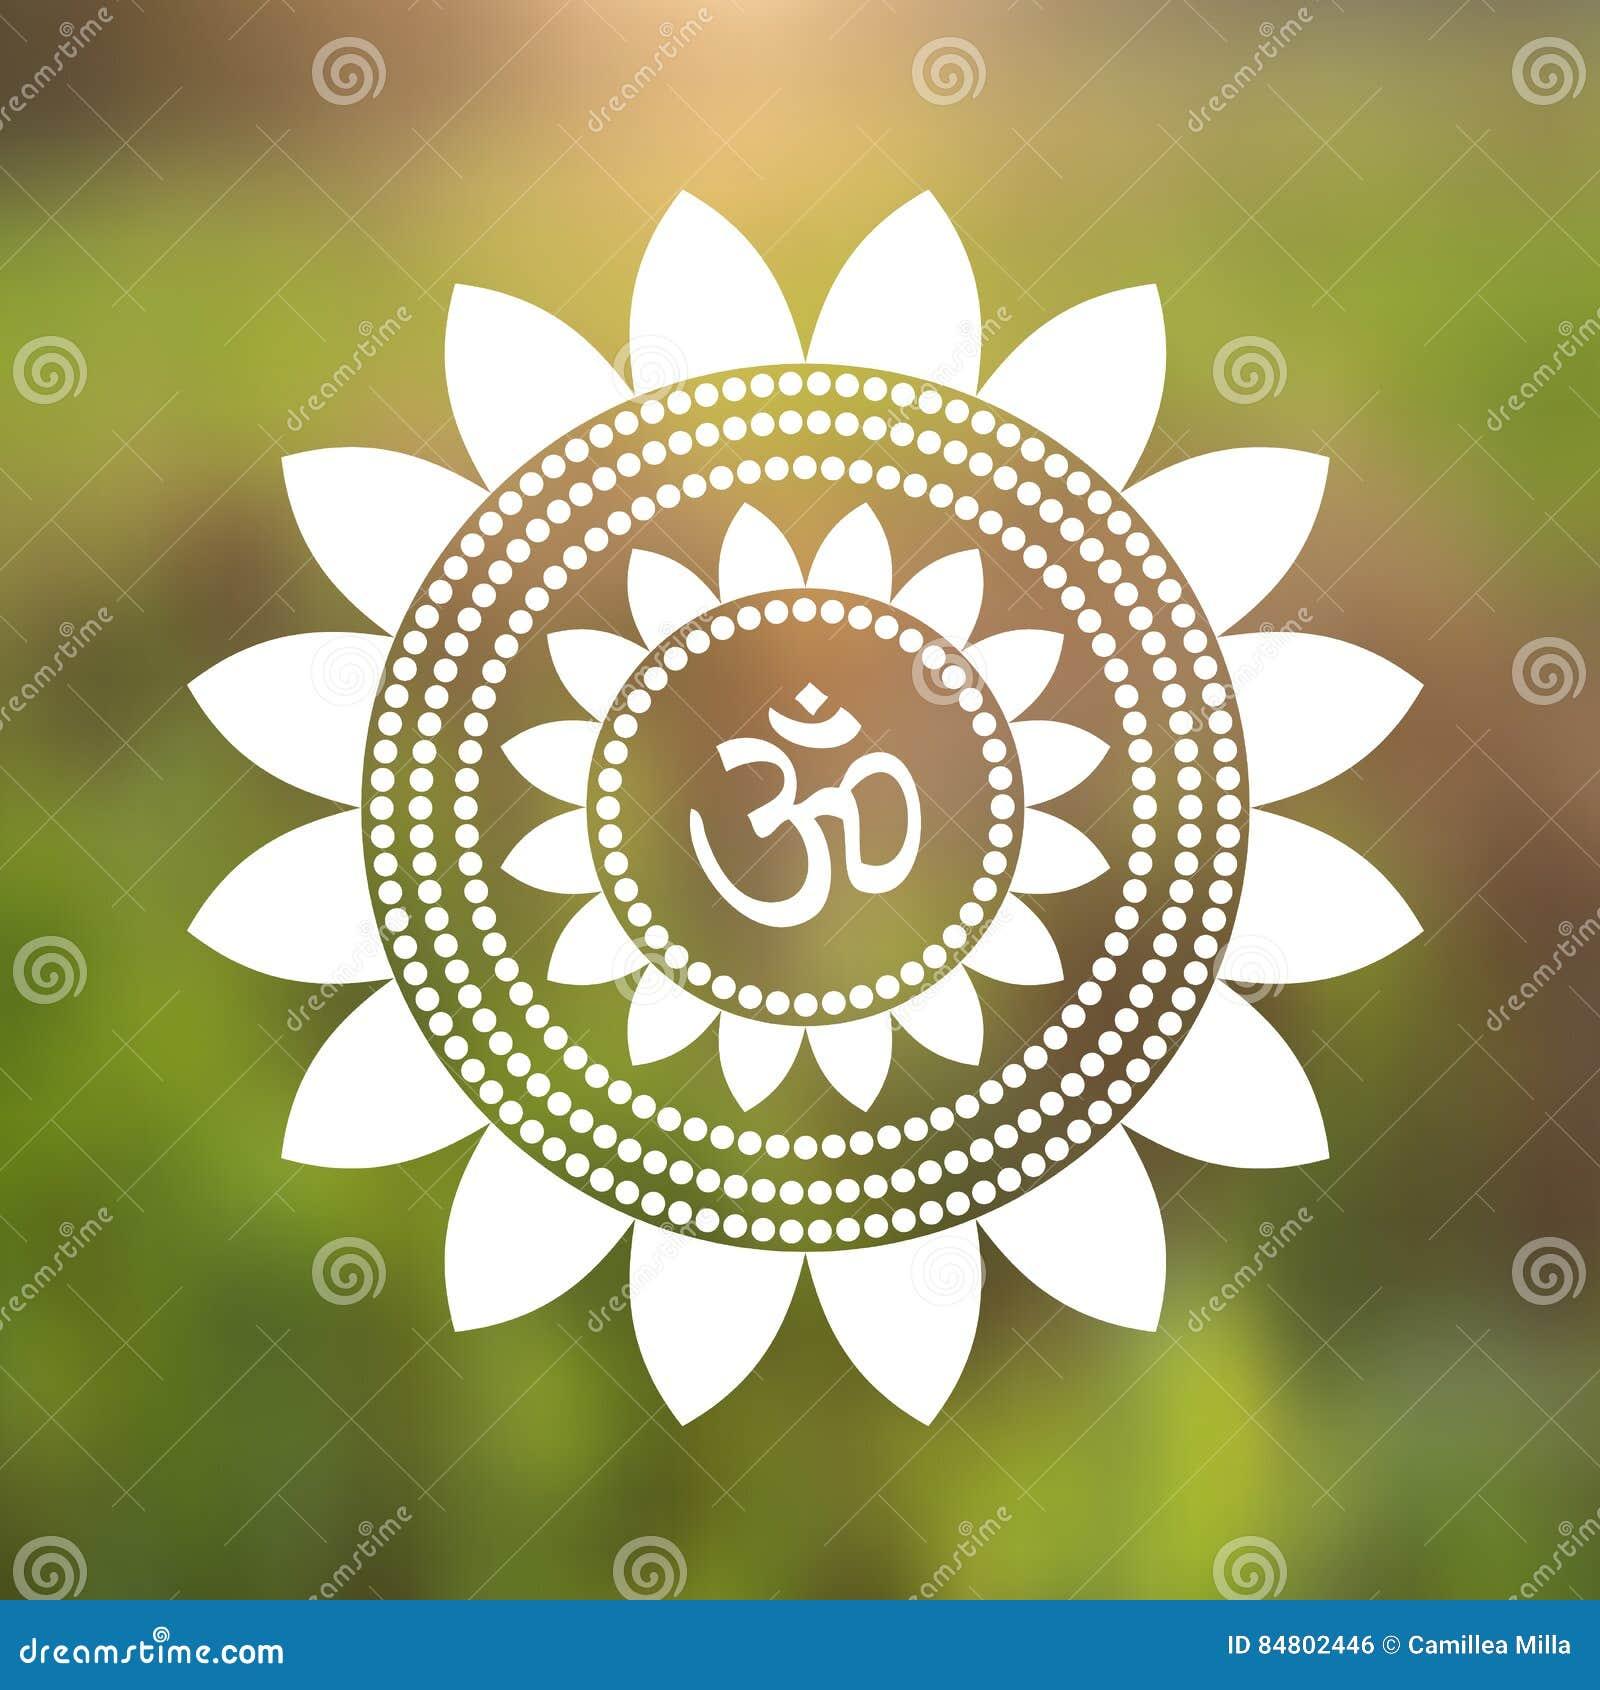 Vector om symbol hindu in lotus flower mandala illustration stock royalty free vector download vector om symbol hindu in lotus flower dhlflorist Gallery